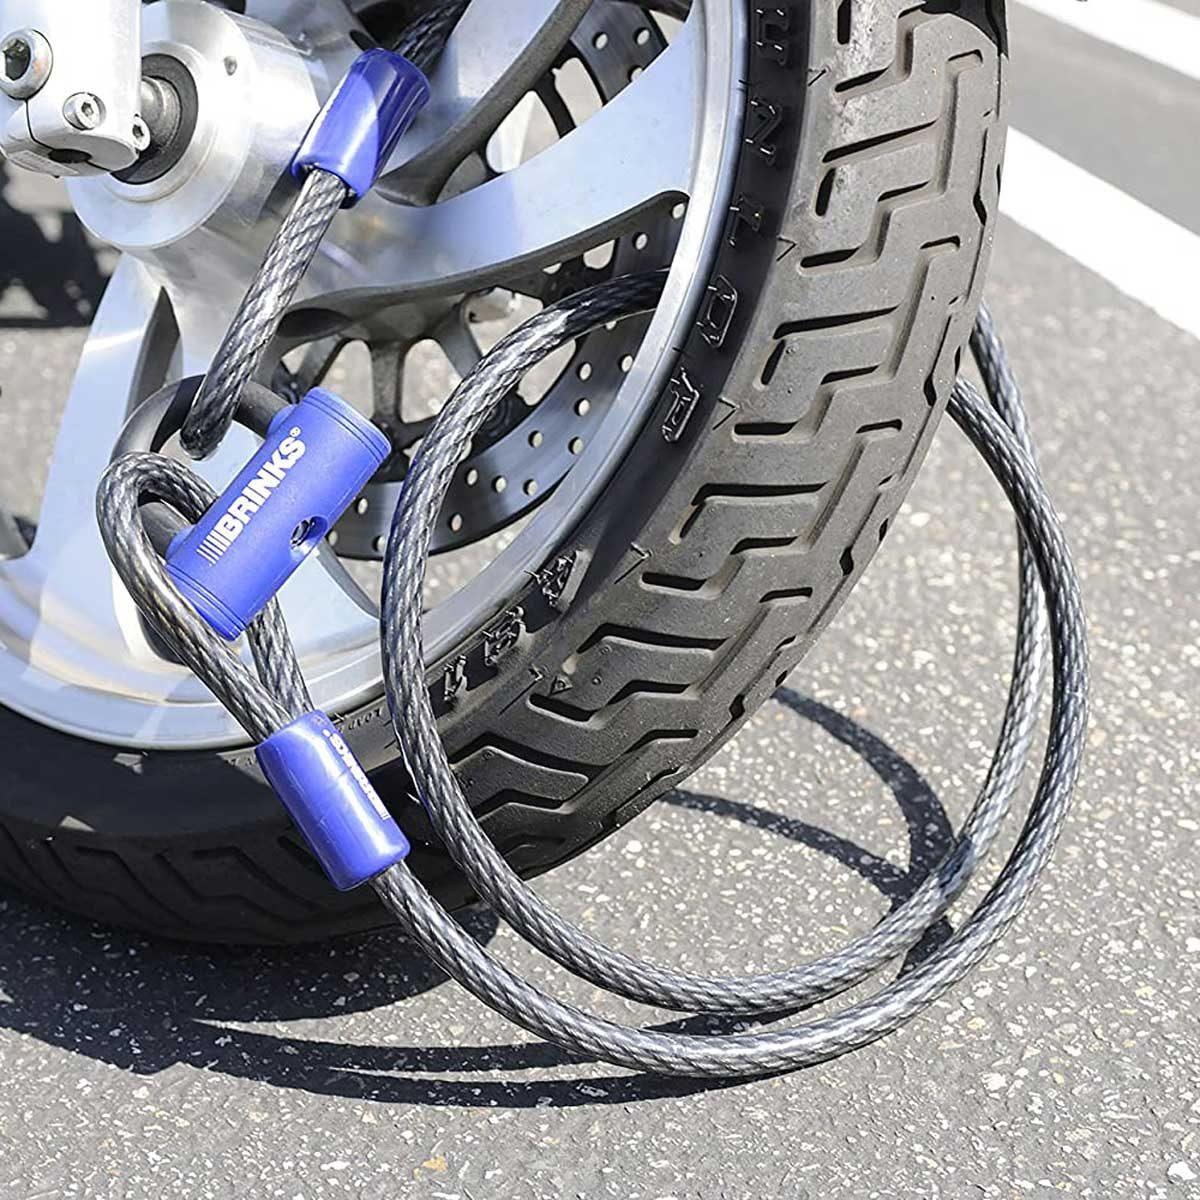 Braided Cable 91vxaykzyil. Ac Sl1500